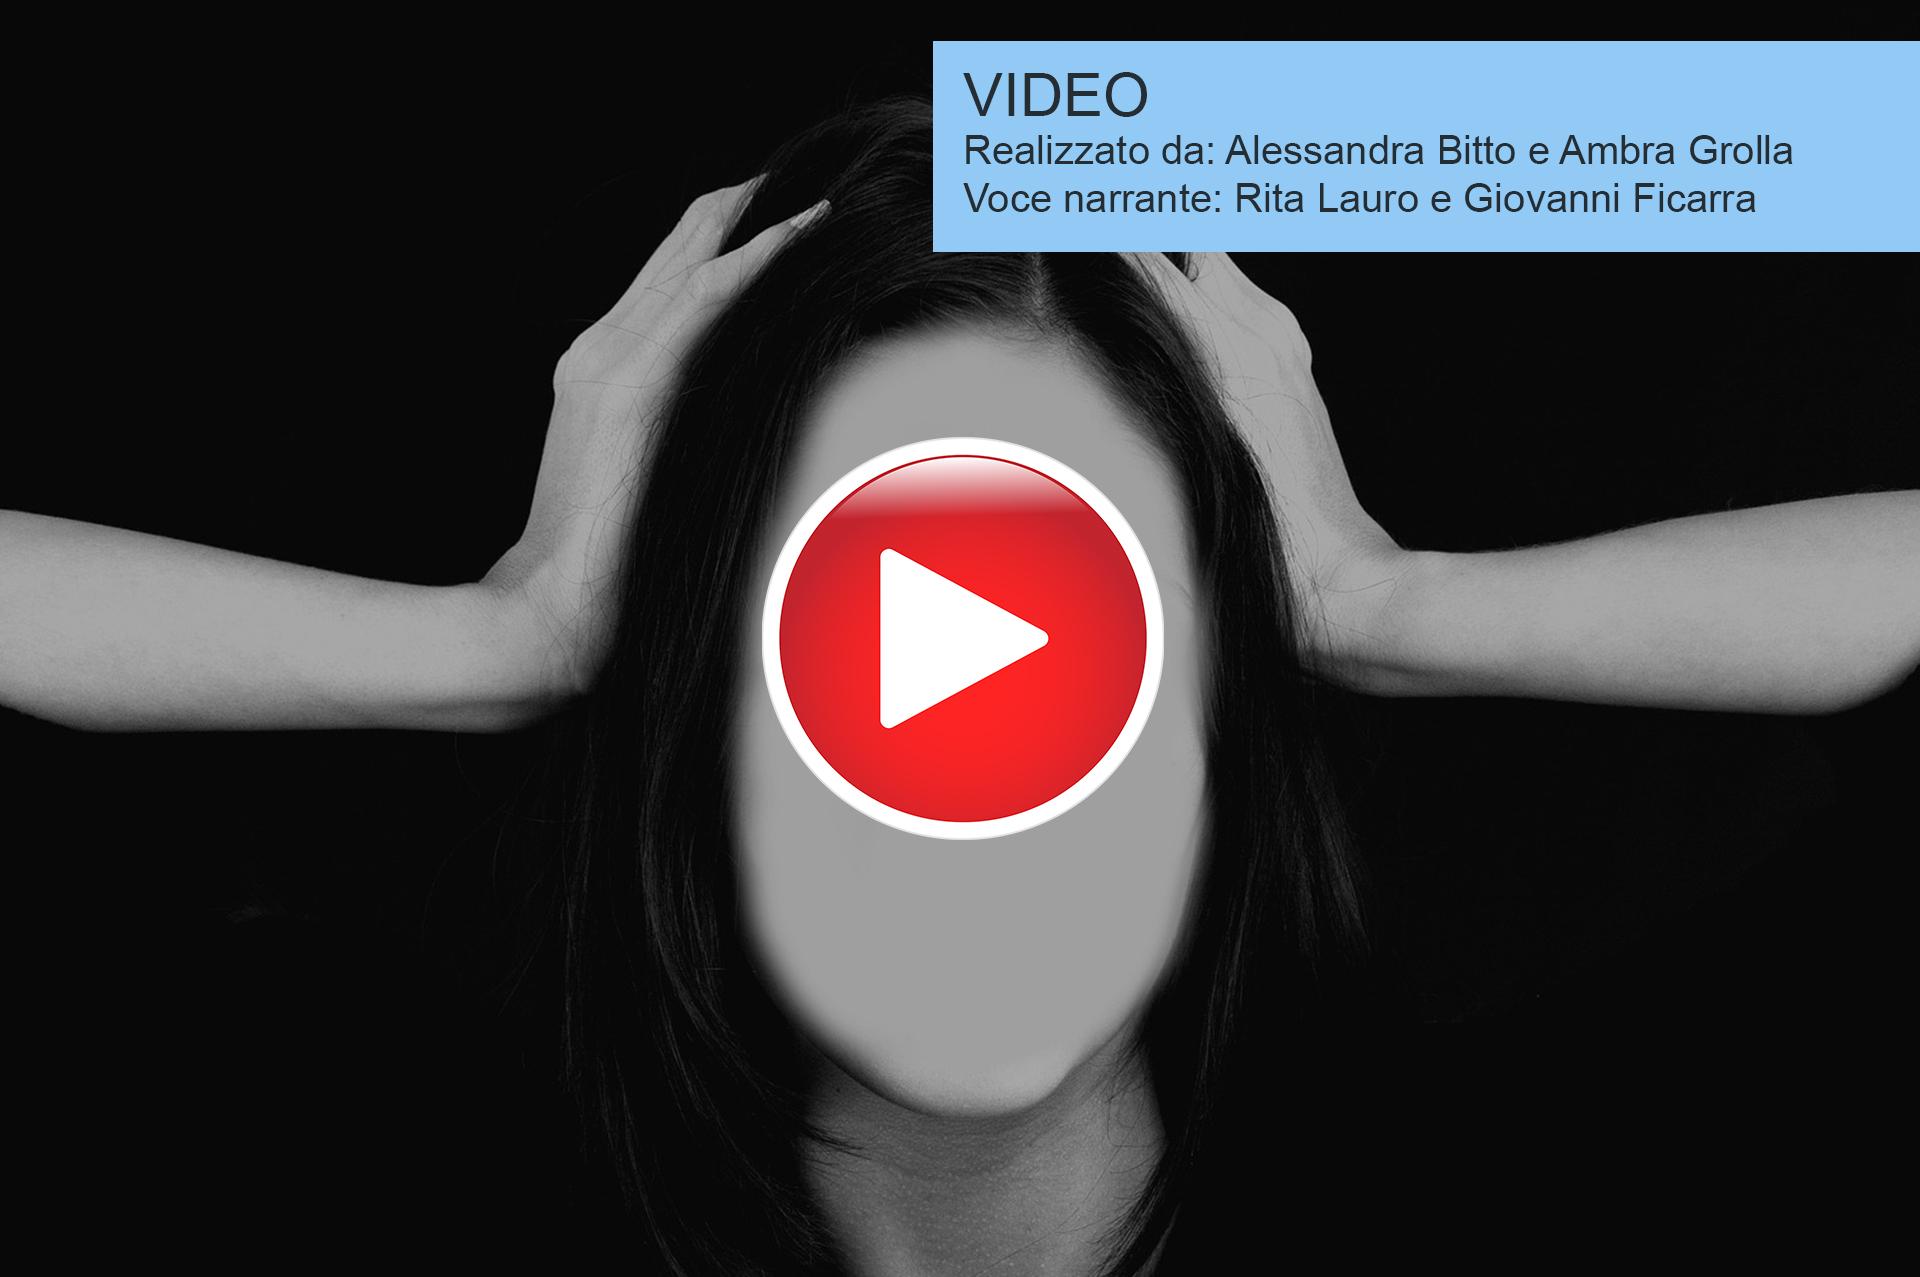 Emicrania video